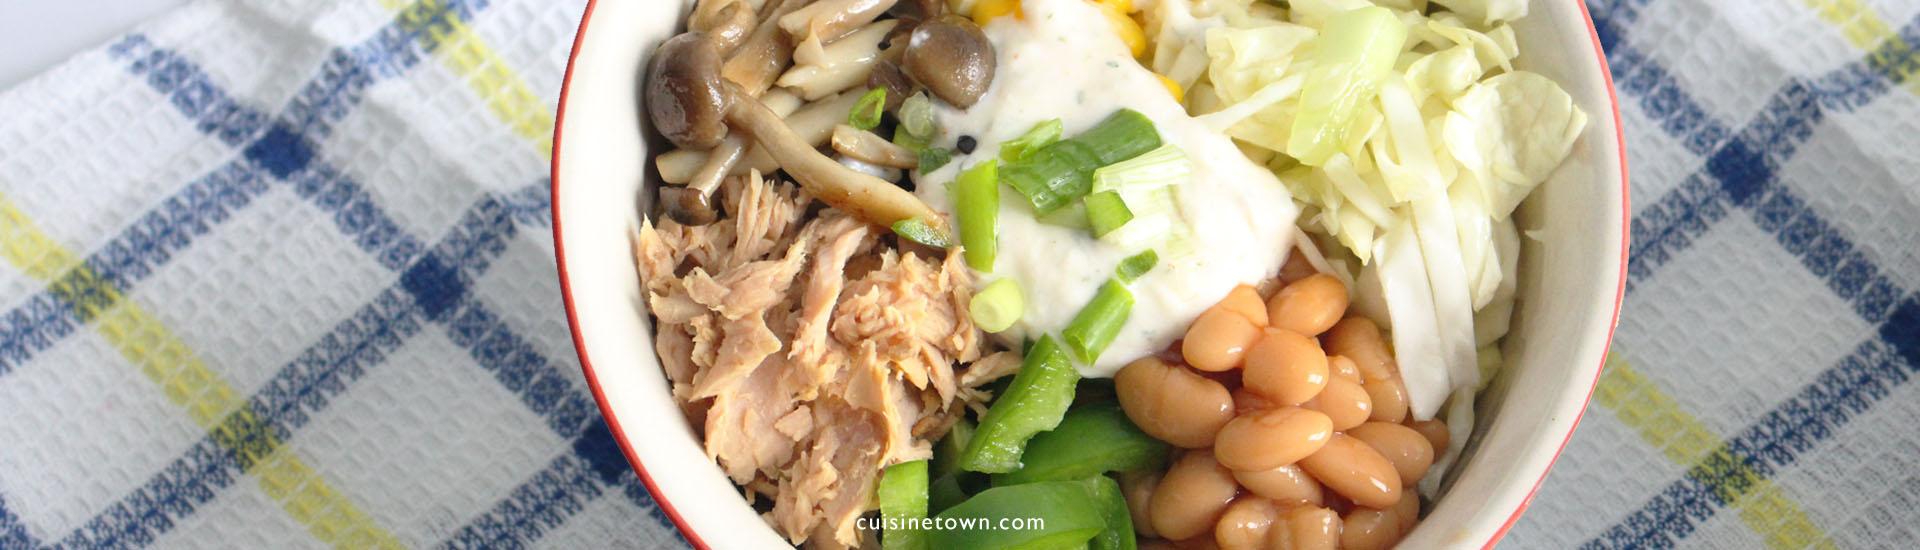 Easy Tuna Burrito Bowls